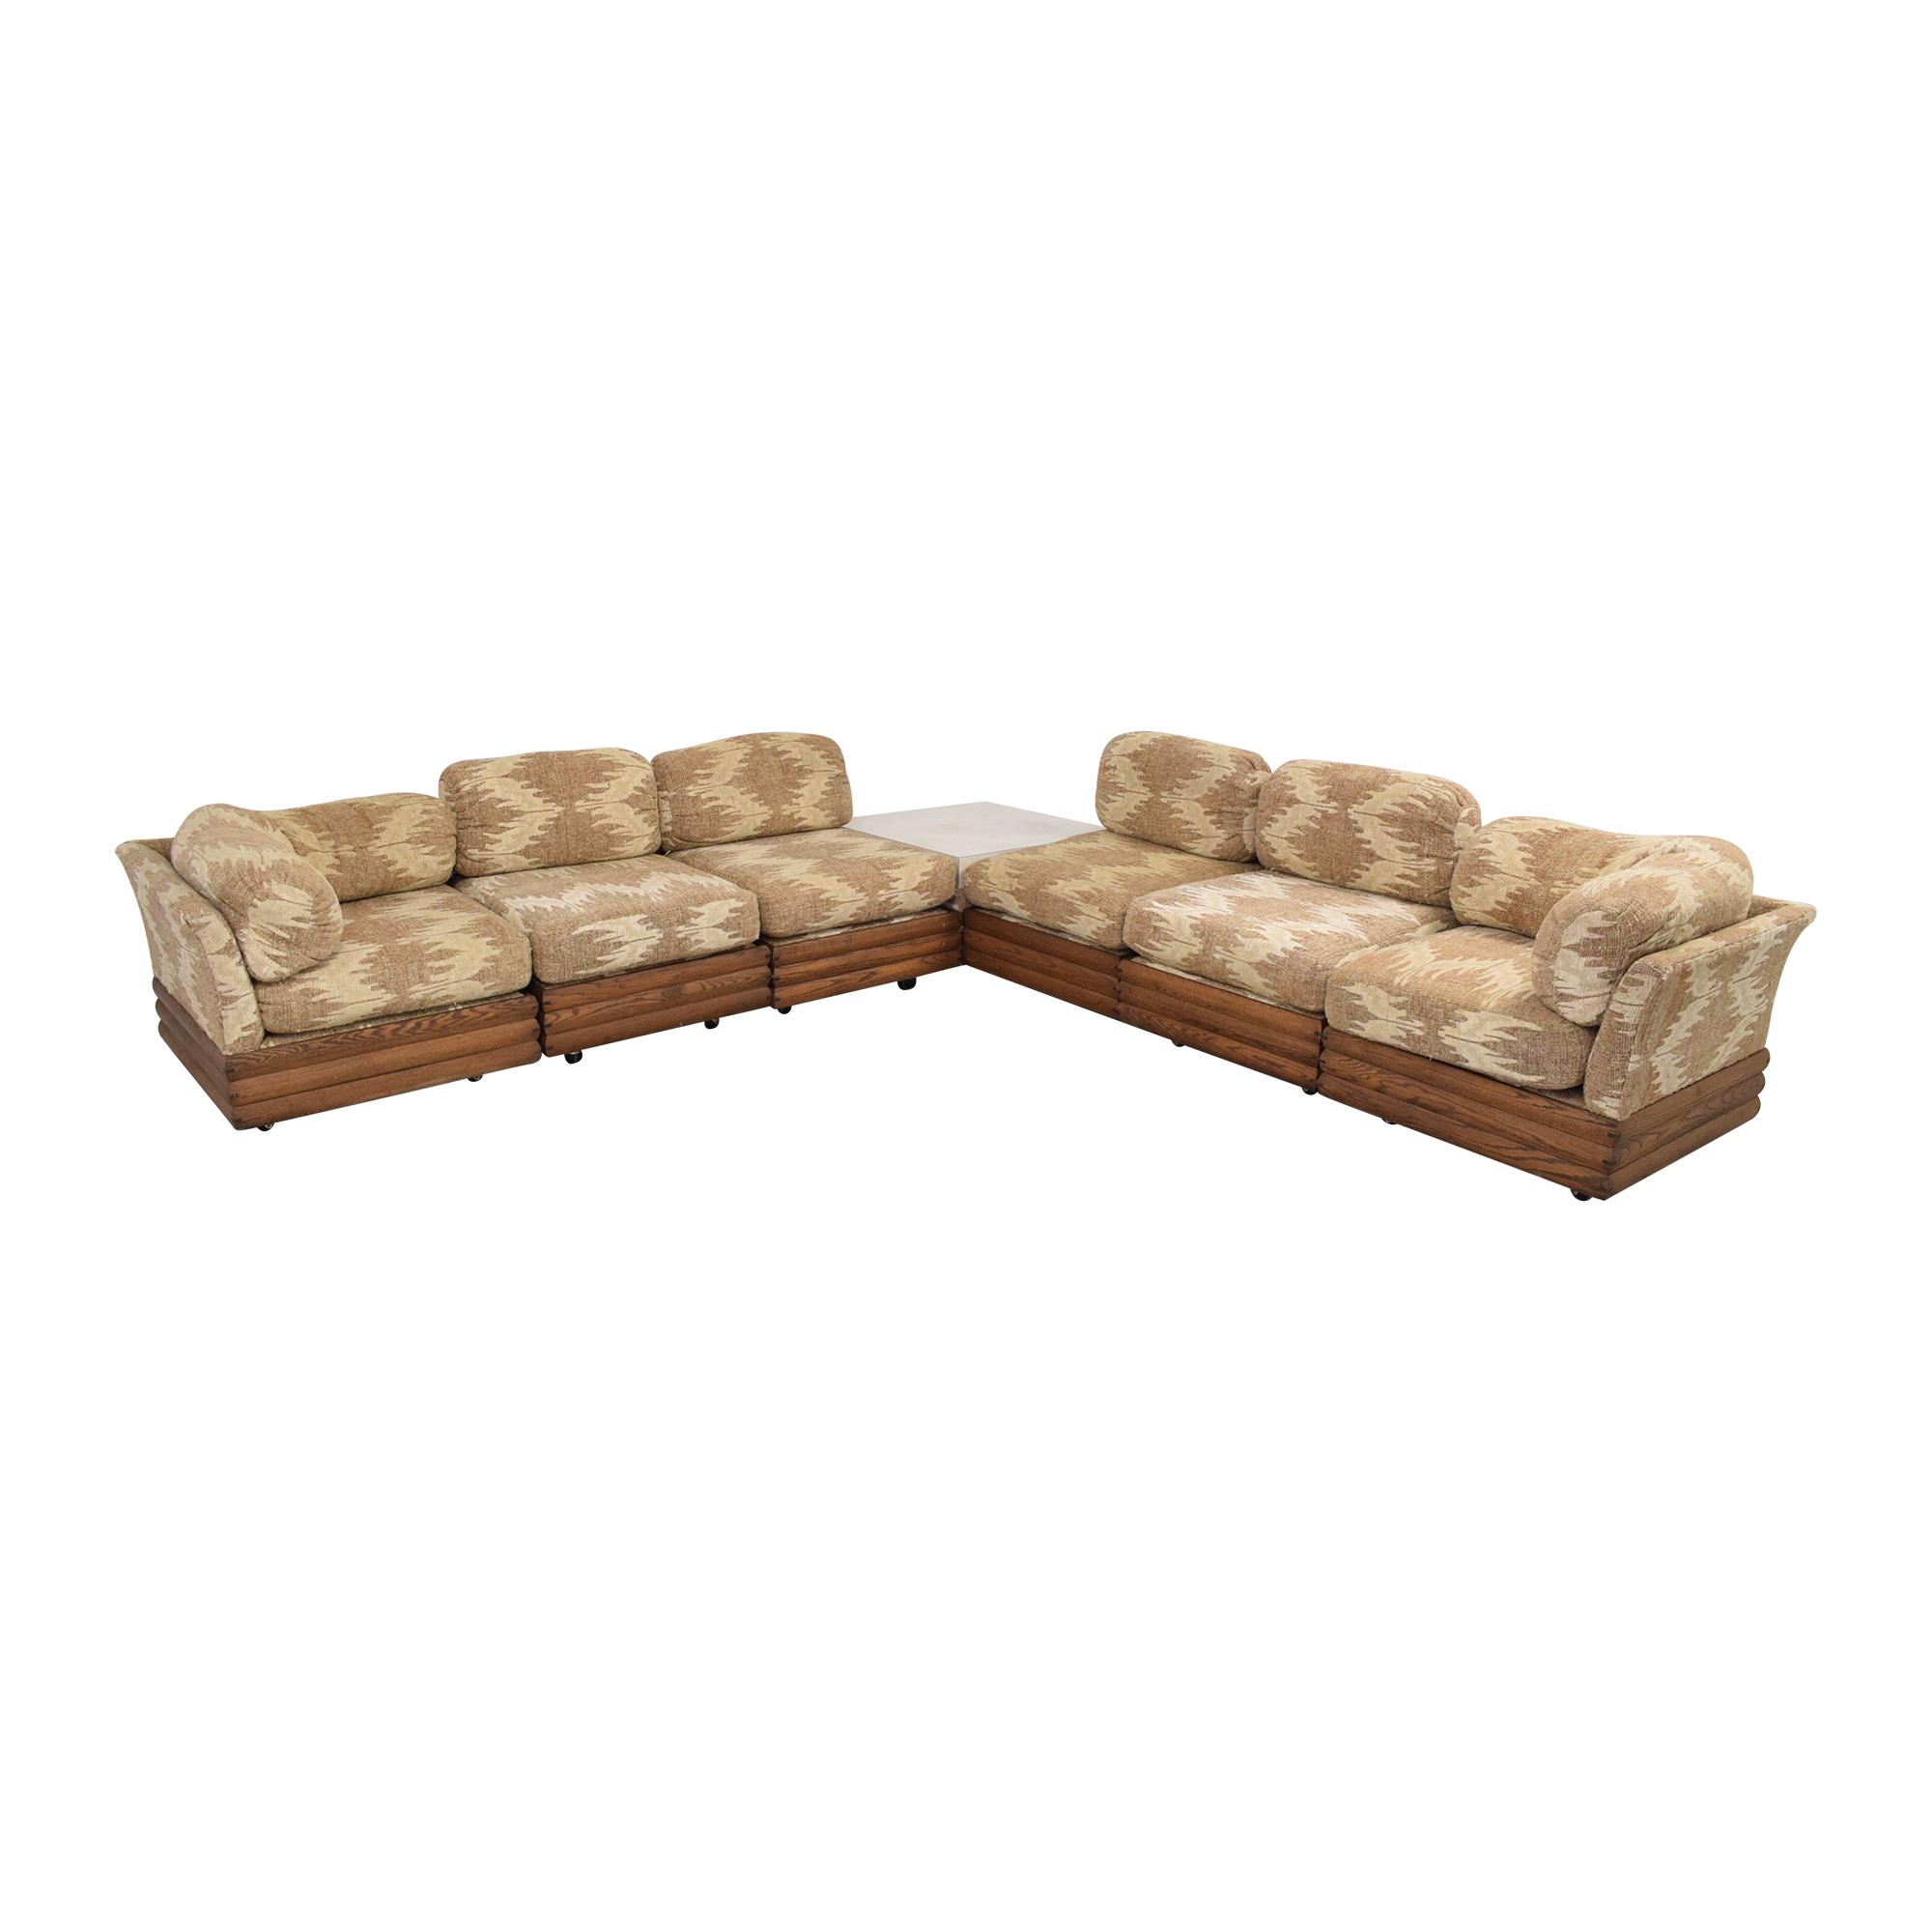 88 off royal lounge royal lounge sectional sofa with corner table sofas